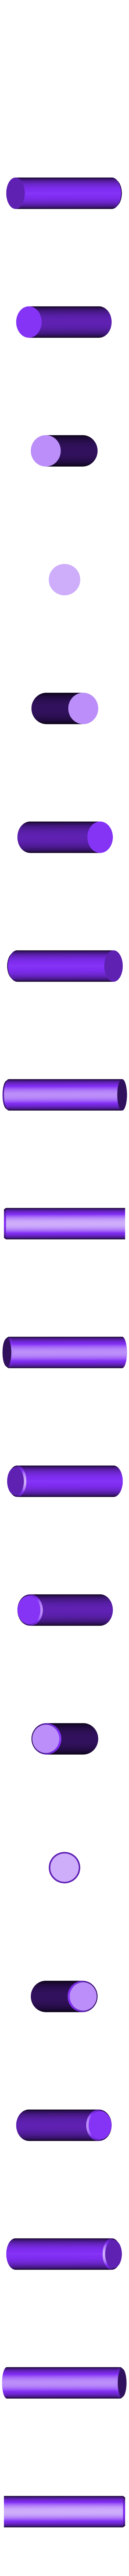 Brake_Air_Reservoir__Long-a.STL Download free STL file 4-8-8-4 Big Boy Locomotive • 3D printer object, RaymondDeLuca